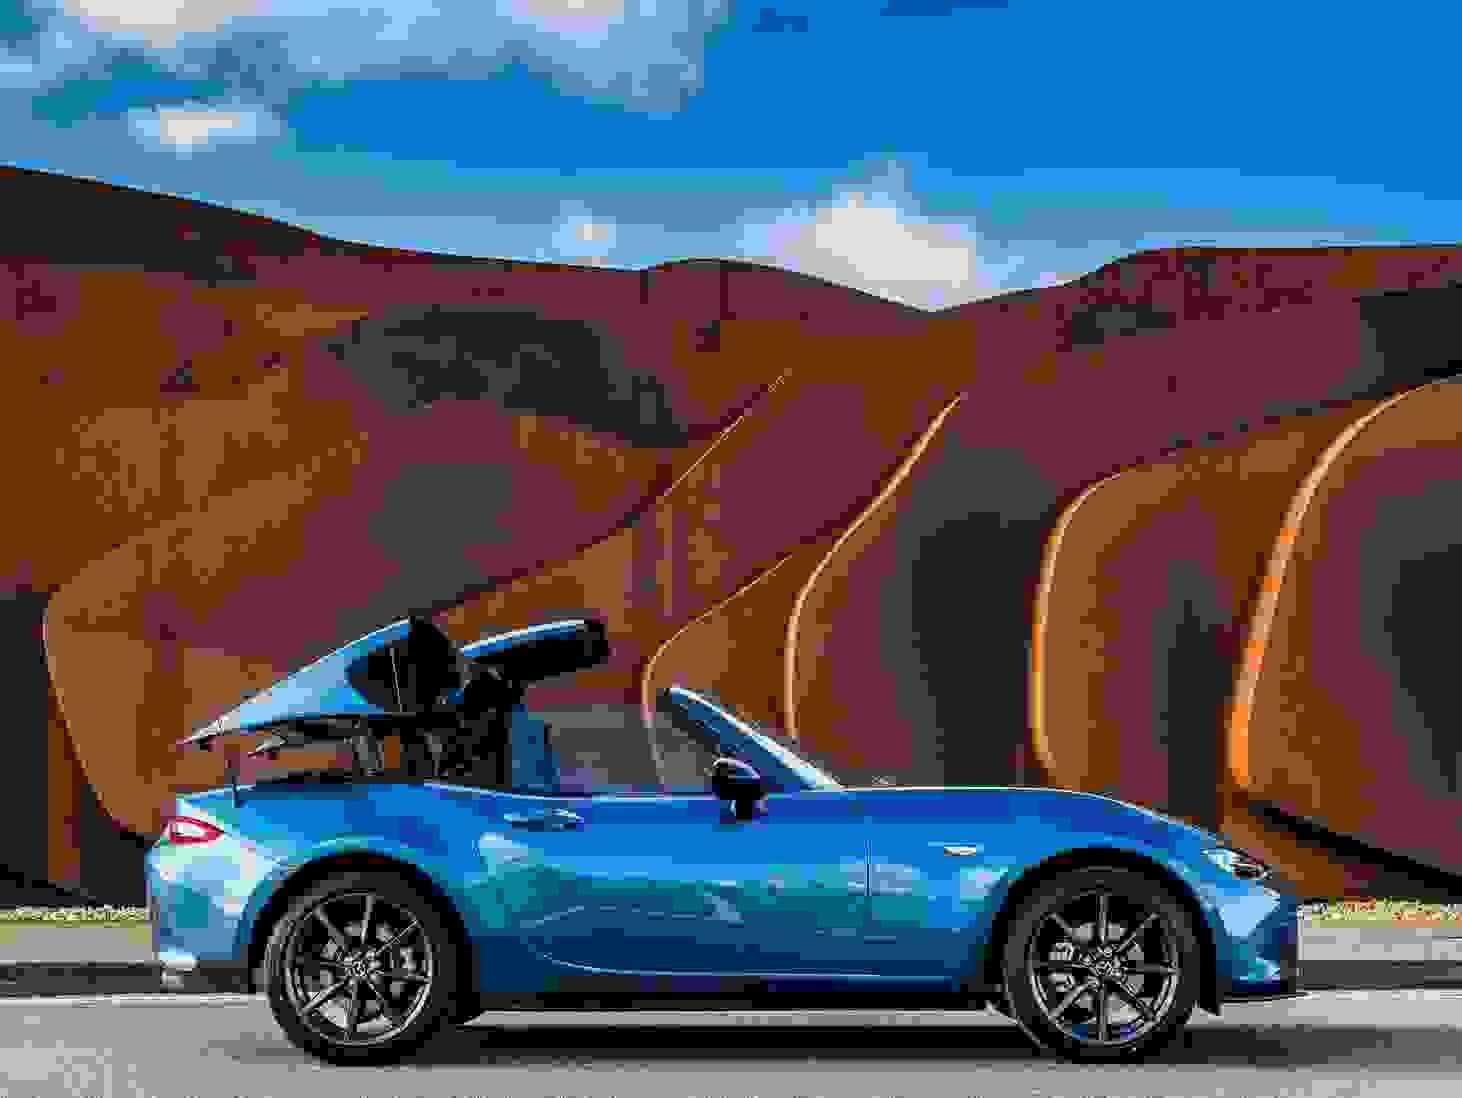 Mazda Mx 5 2018 Eksterior Fastback Aaben Bil Roadster Sportsvogn